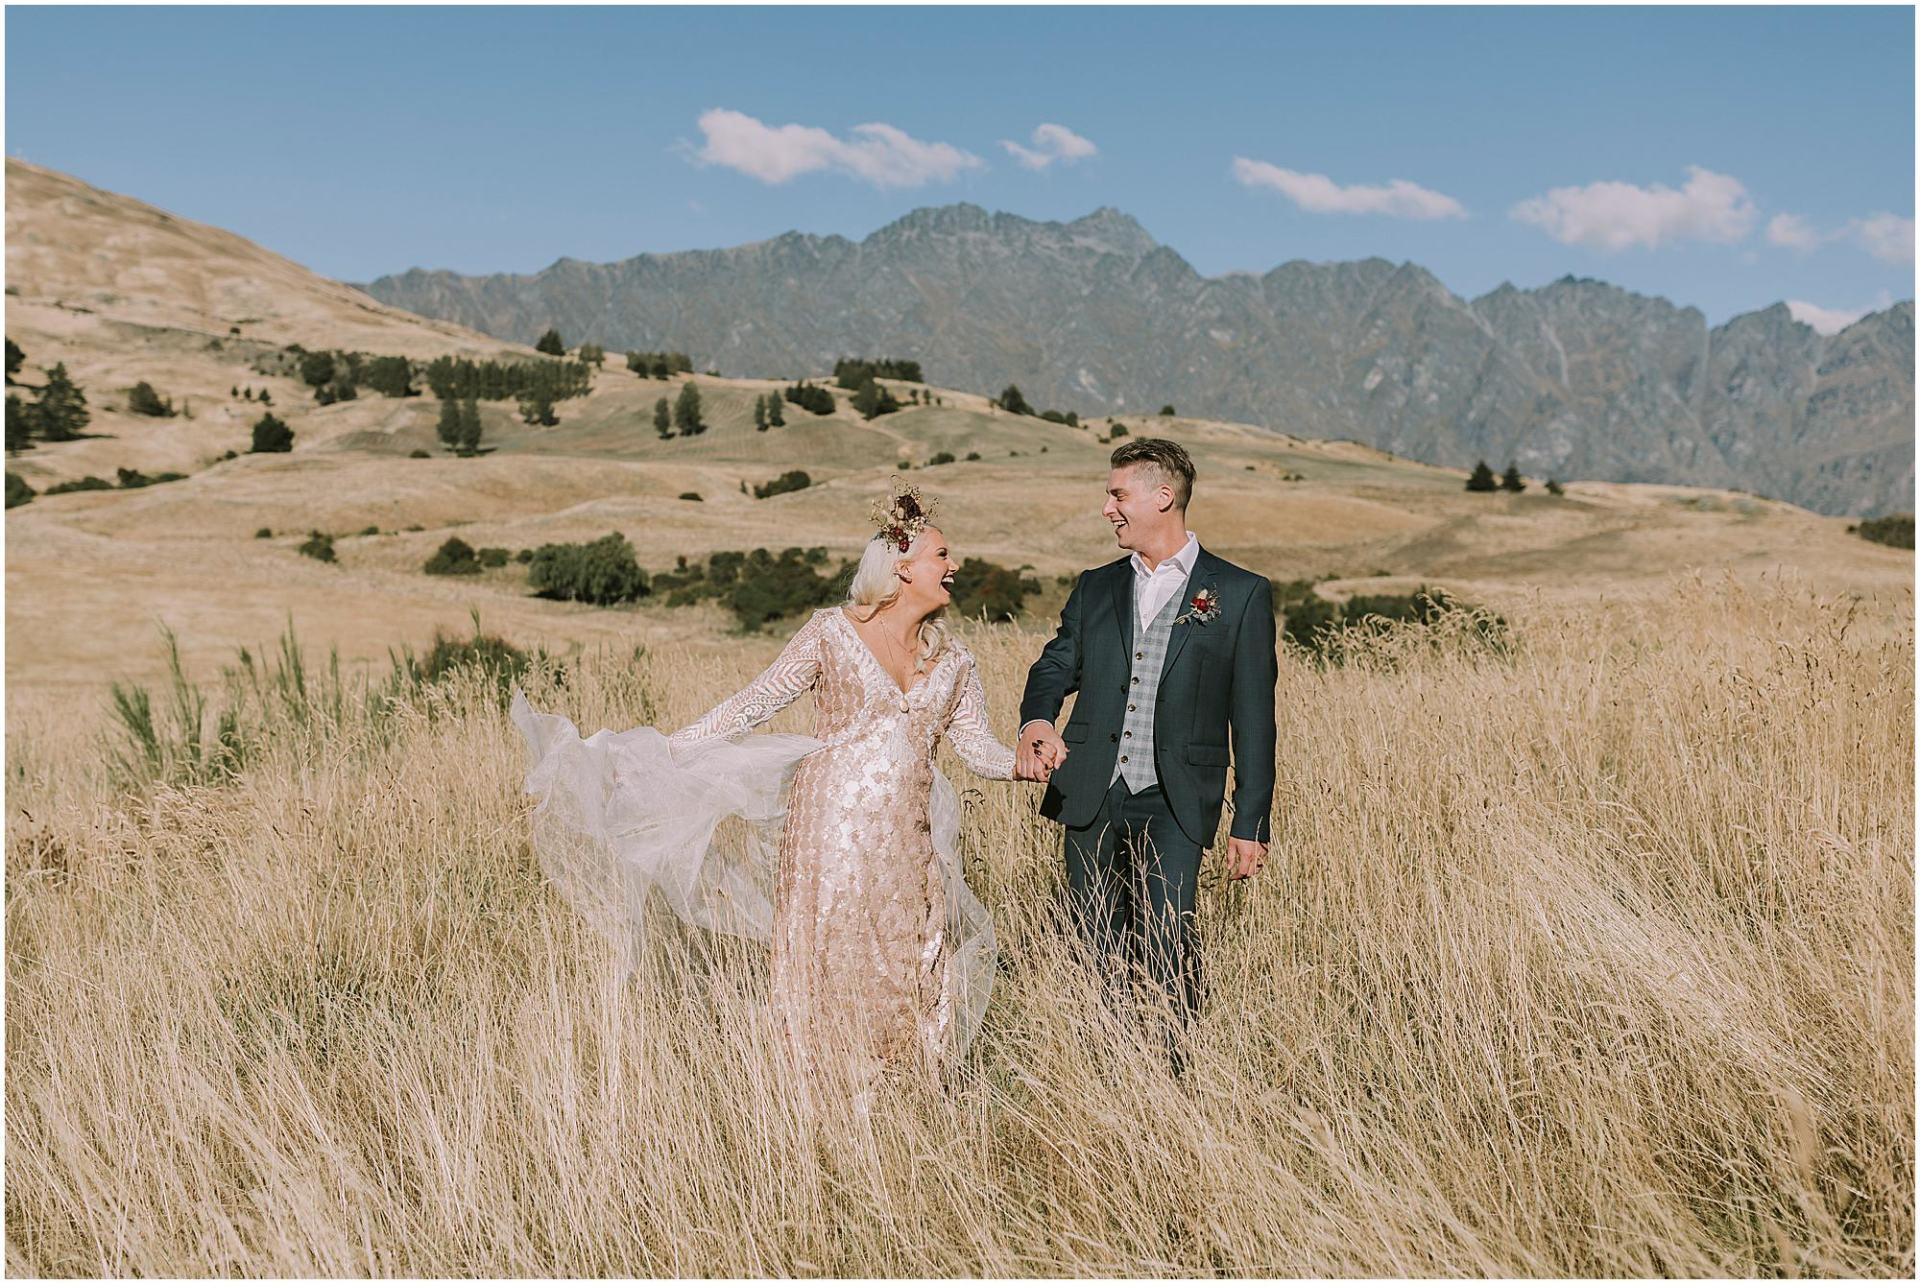 Boho & groom - Queenstown Wedding Photographer Charlotte Kiri